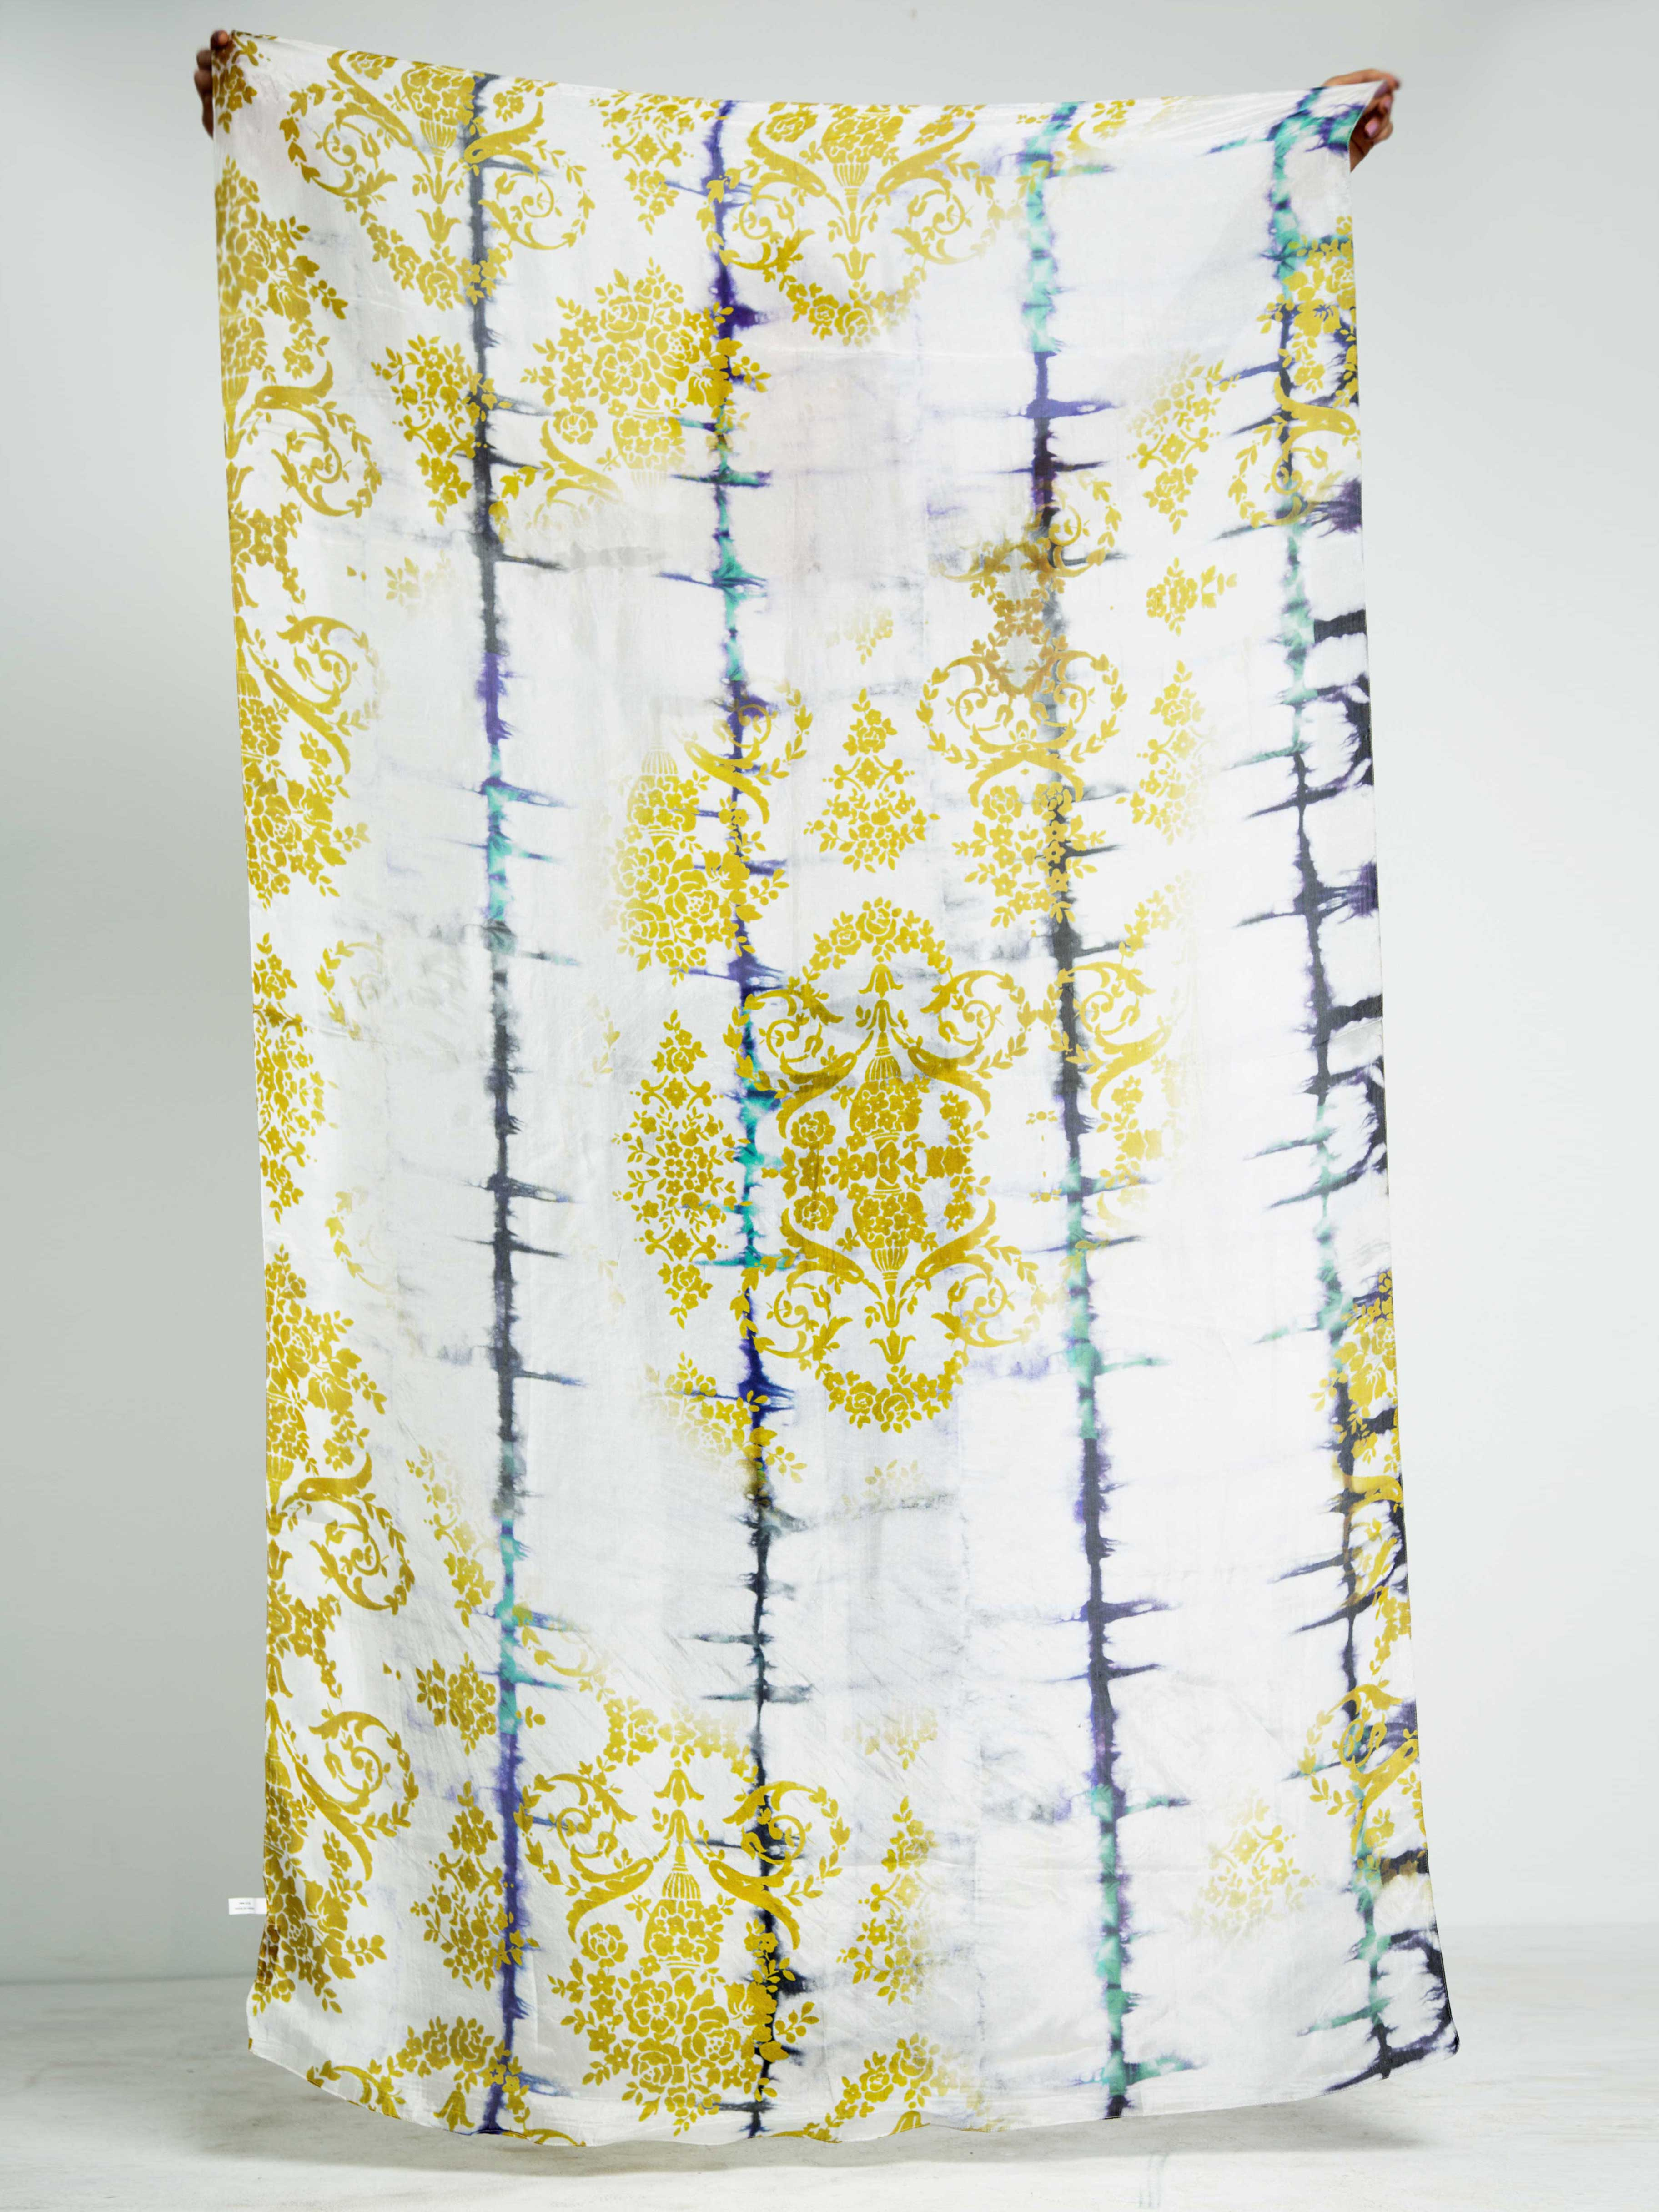 shiboriscarf-victorianprintscarf-shiboristripes-mustardscarf-indigoscarf-resortwear-springsummer2016-maati-Holidayshopping-holidaygifts-giftforher-blackfriday-cybermondaydeals-blackfridaydeals